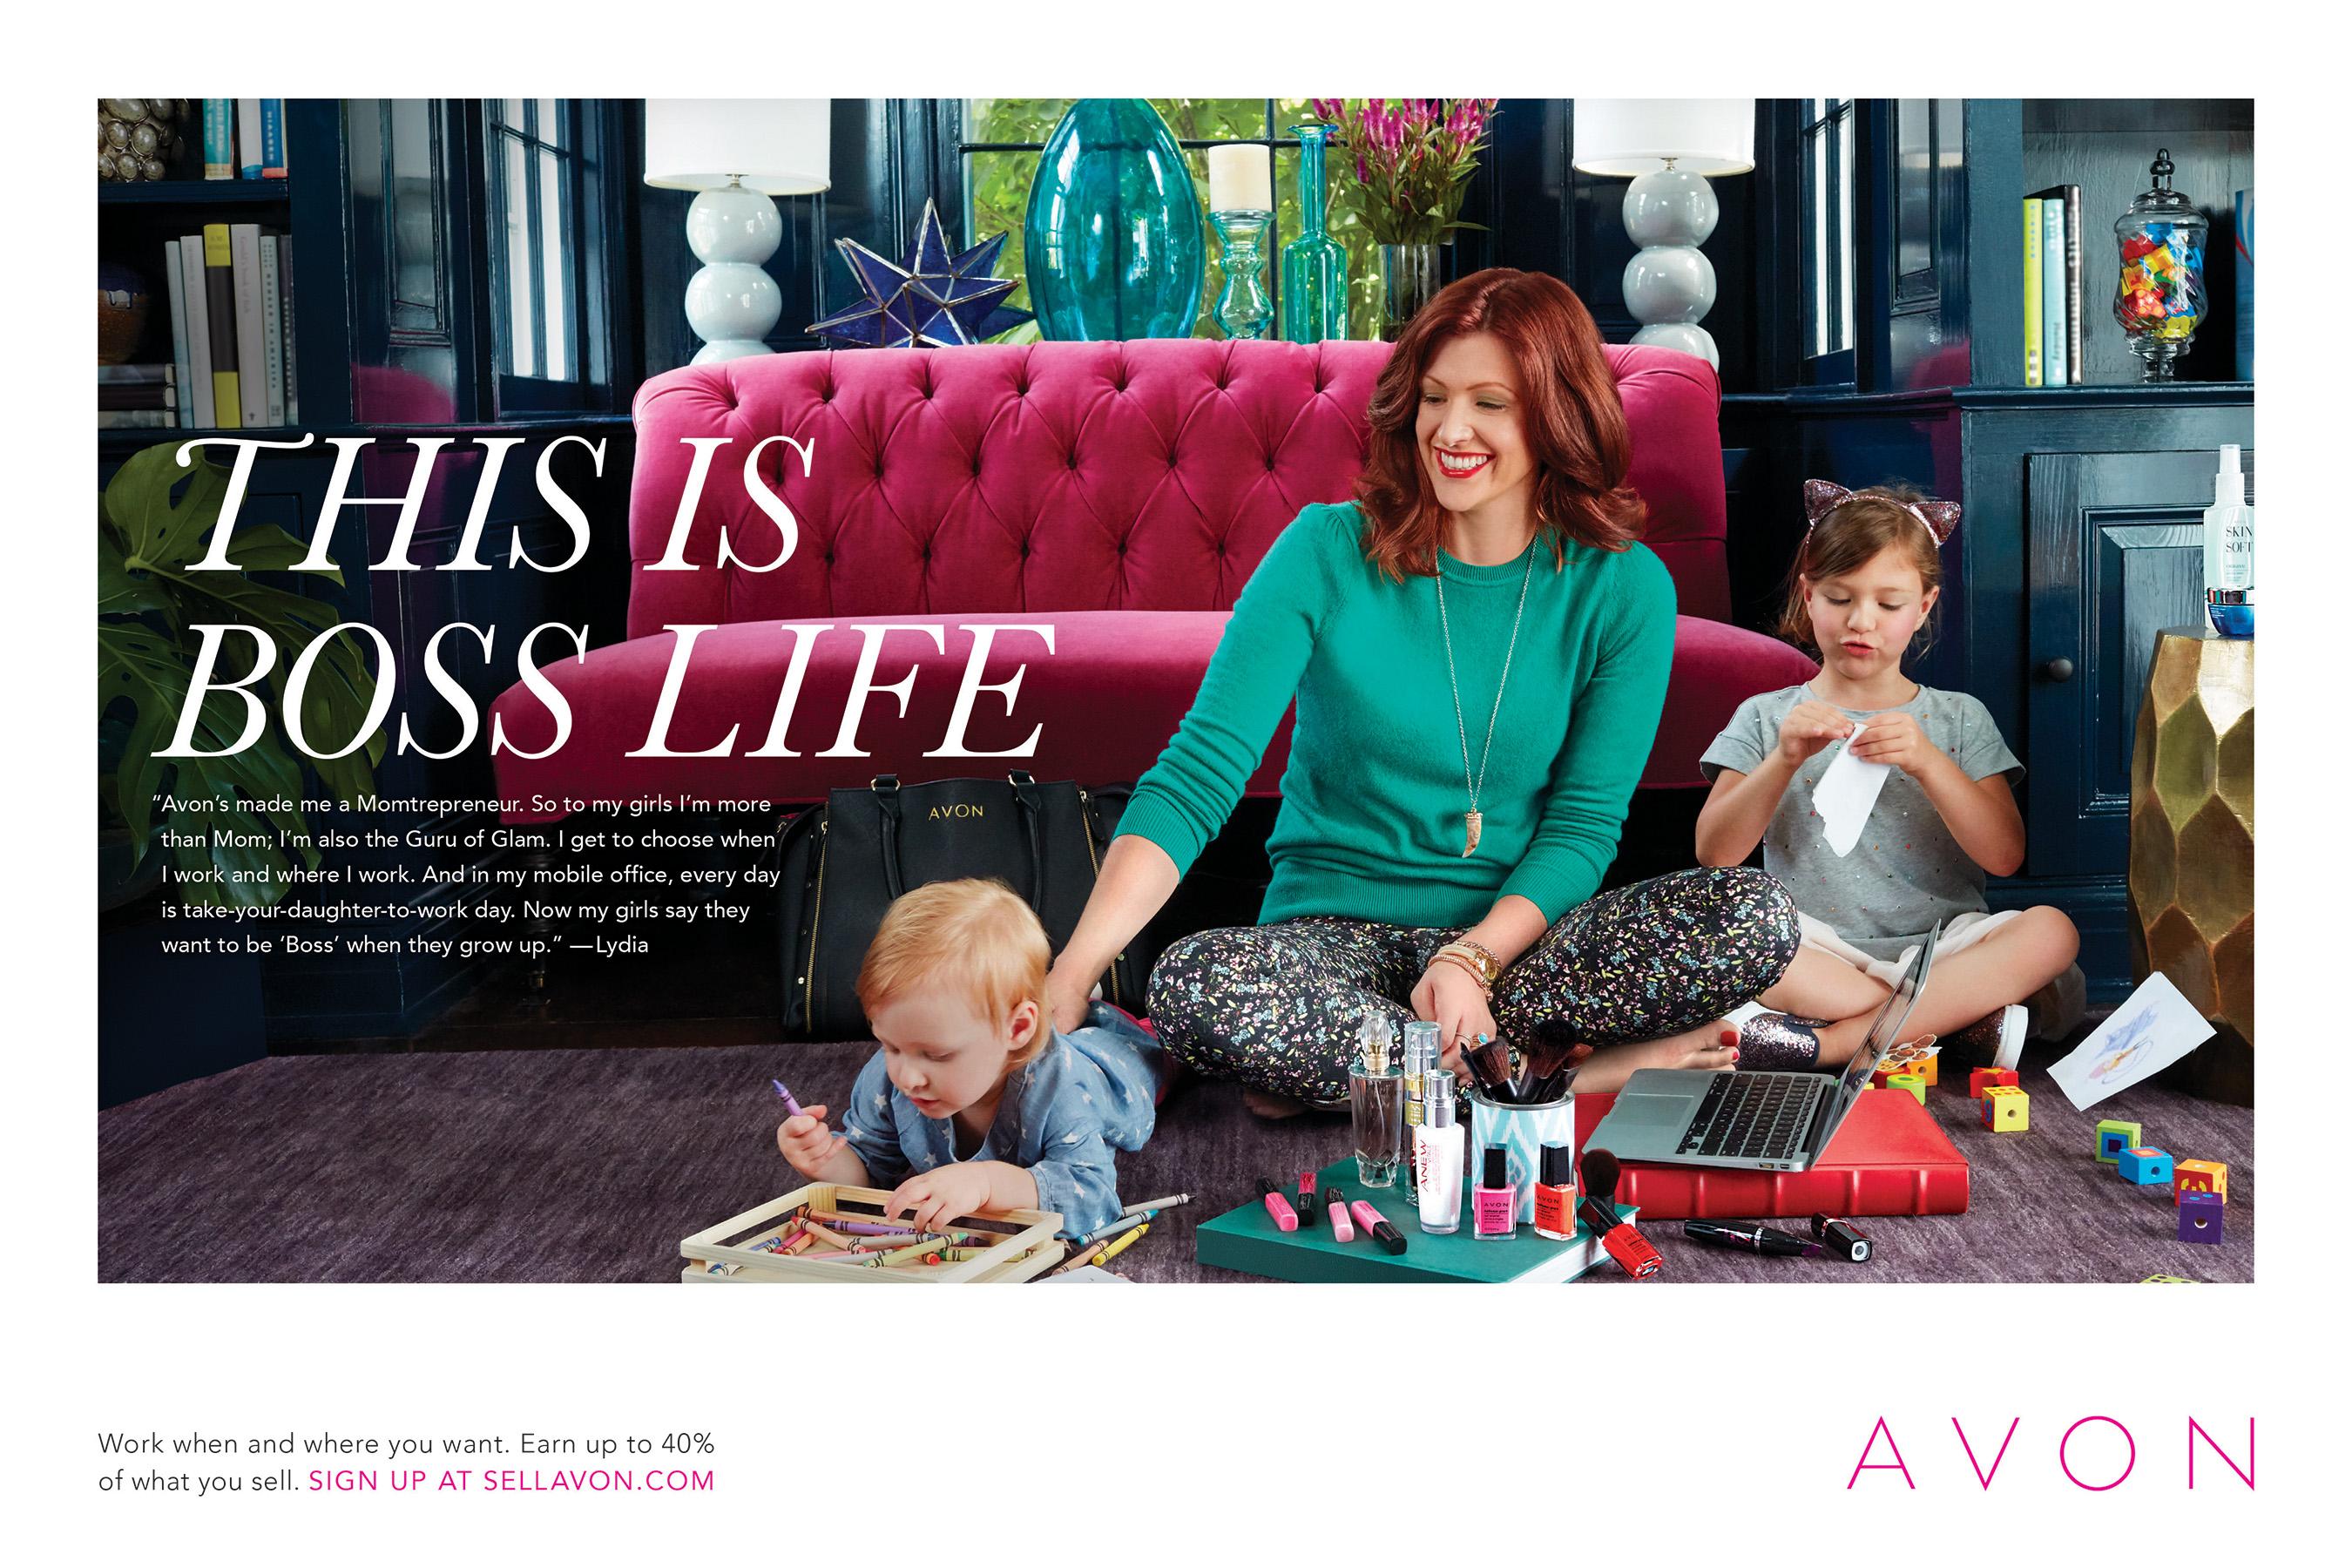 this-is-boss-life-print-advertising-featuring-avon-representative-lydia